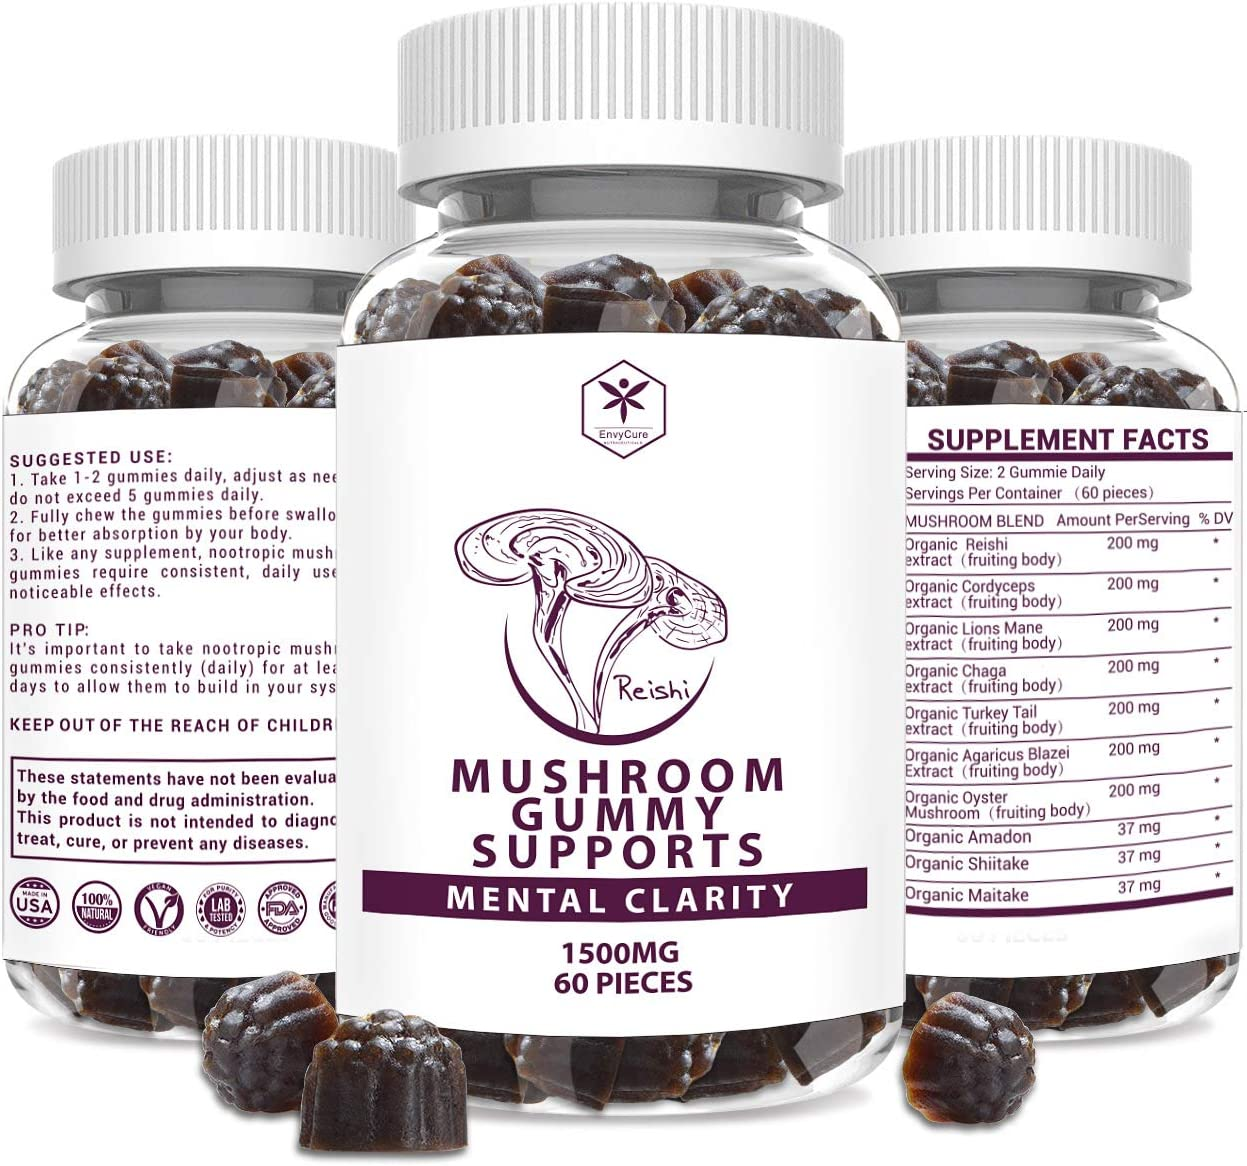 Lions Mane Mushroom Supplement for Humans Organic Gummies Nootropic Brain Supplement, Cordyceps Reishi & Shitake Maitake Turkey Men & Women, 60 pcs Vegan